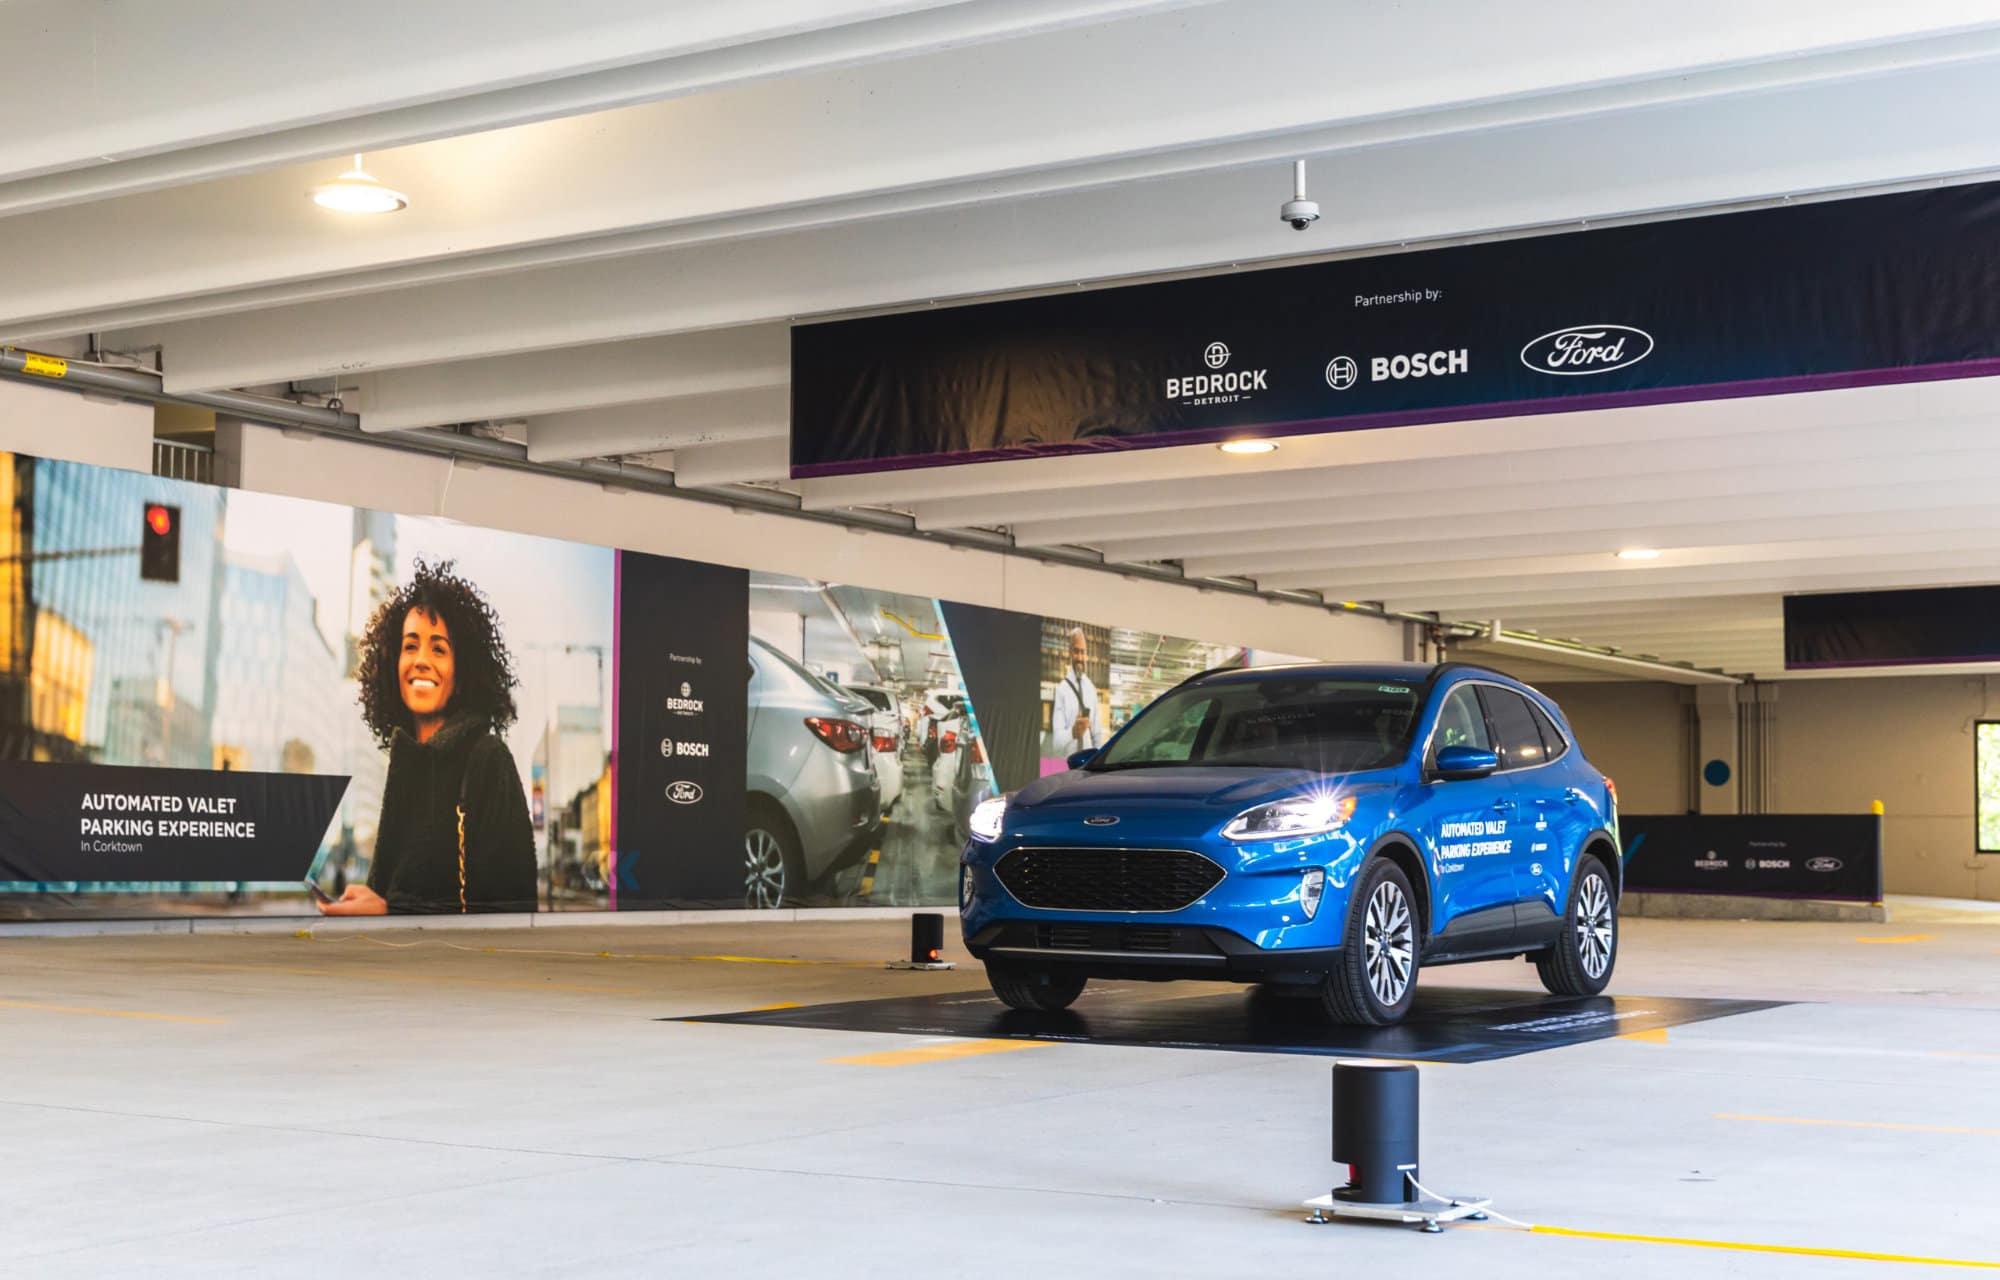 Ford, Bosch en Bedrock werken samen aan mobiliteit